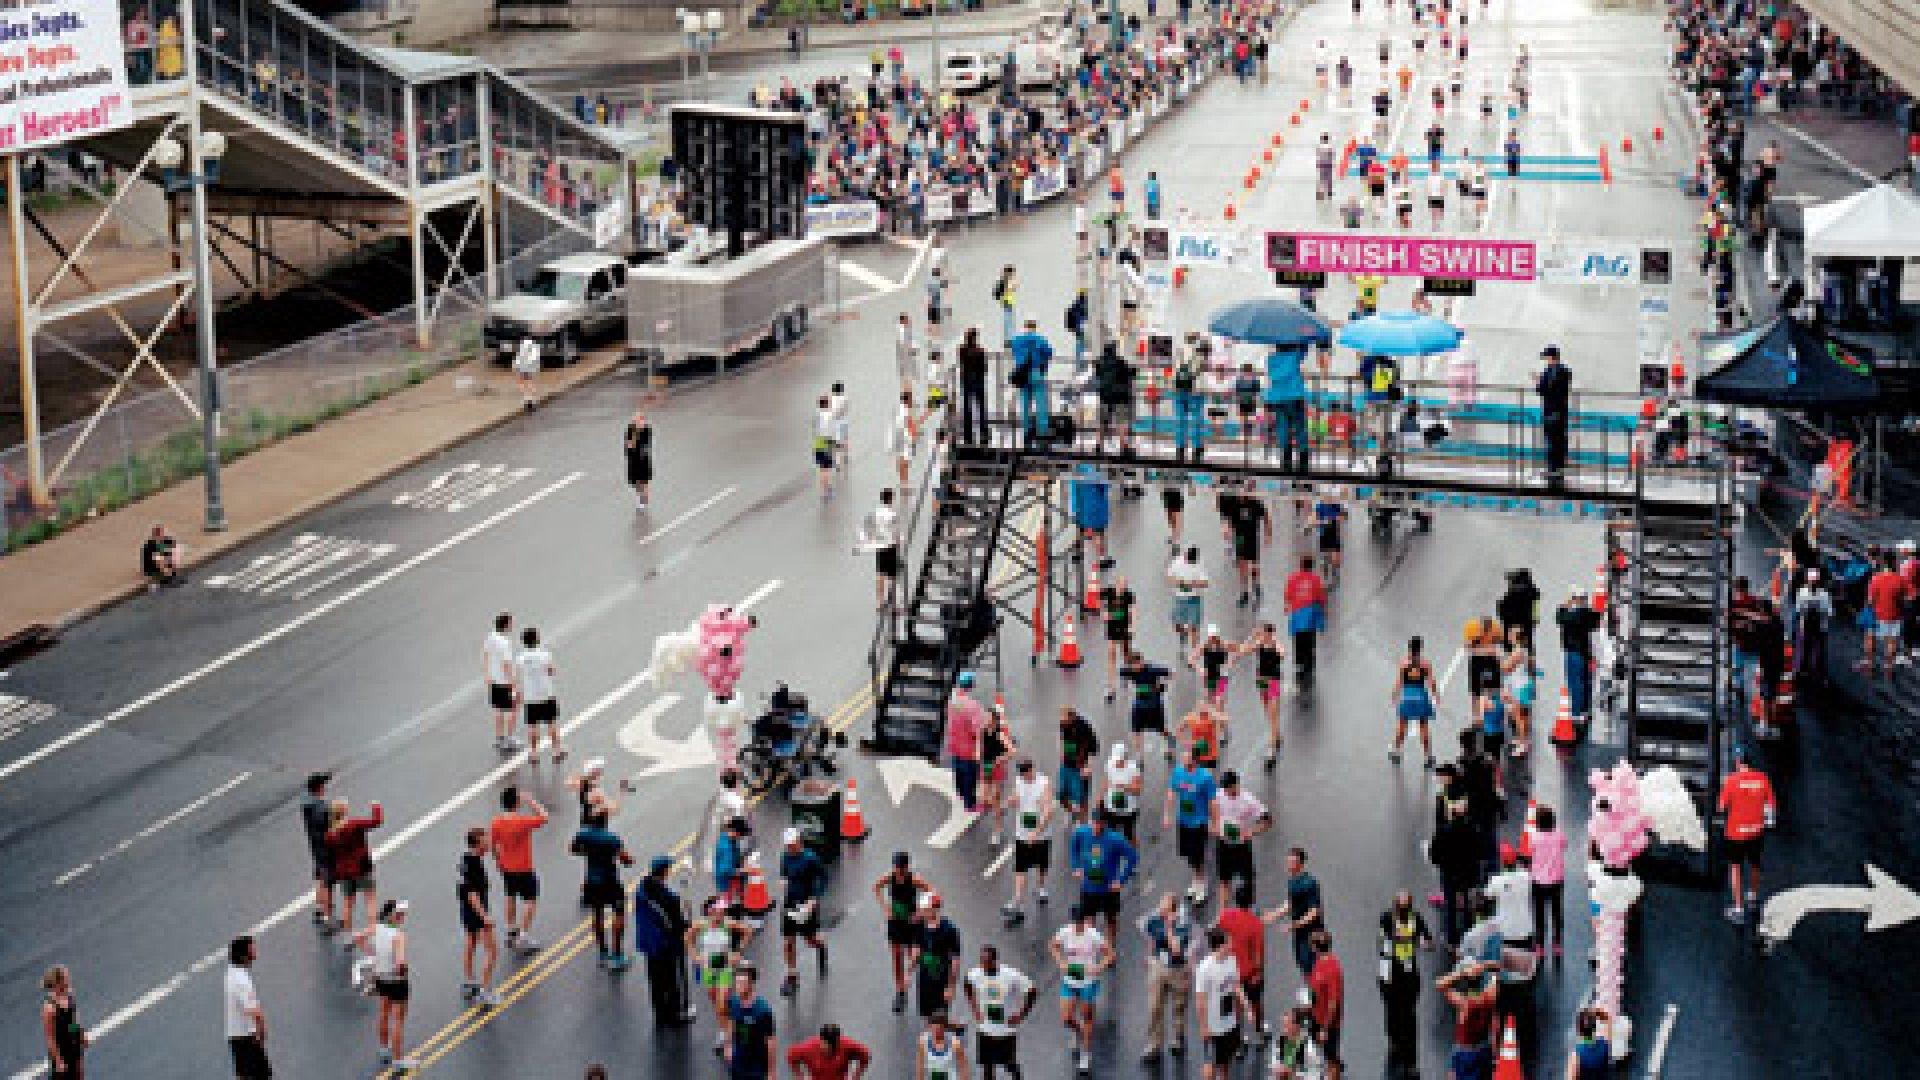 <strong>Cincinnati Flying Pig Marathon, Cincinnati</strong> | 05.01.11 8:27 A.M.